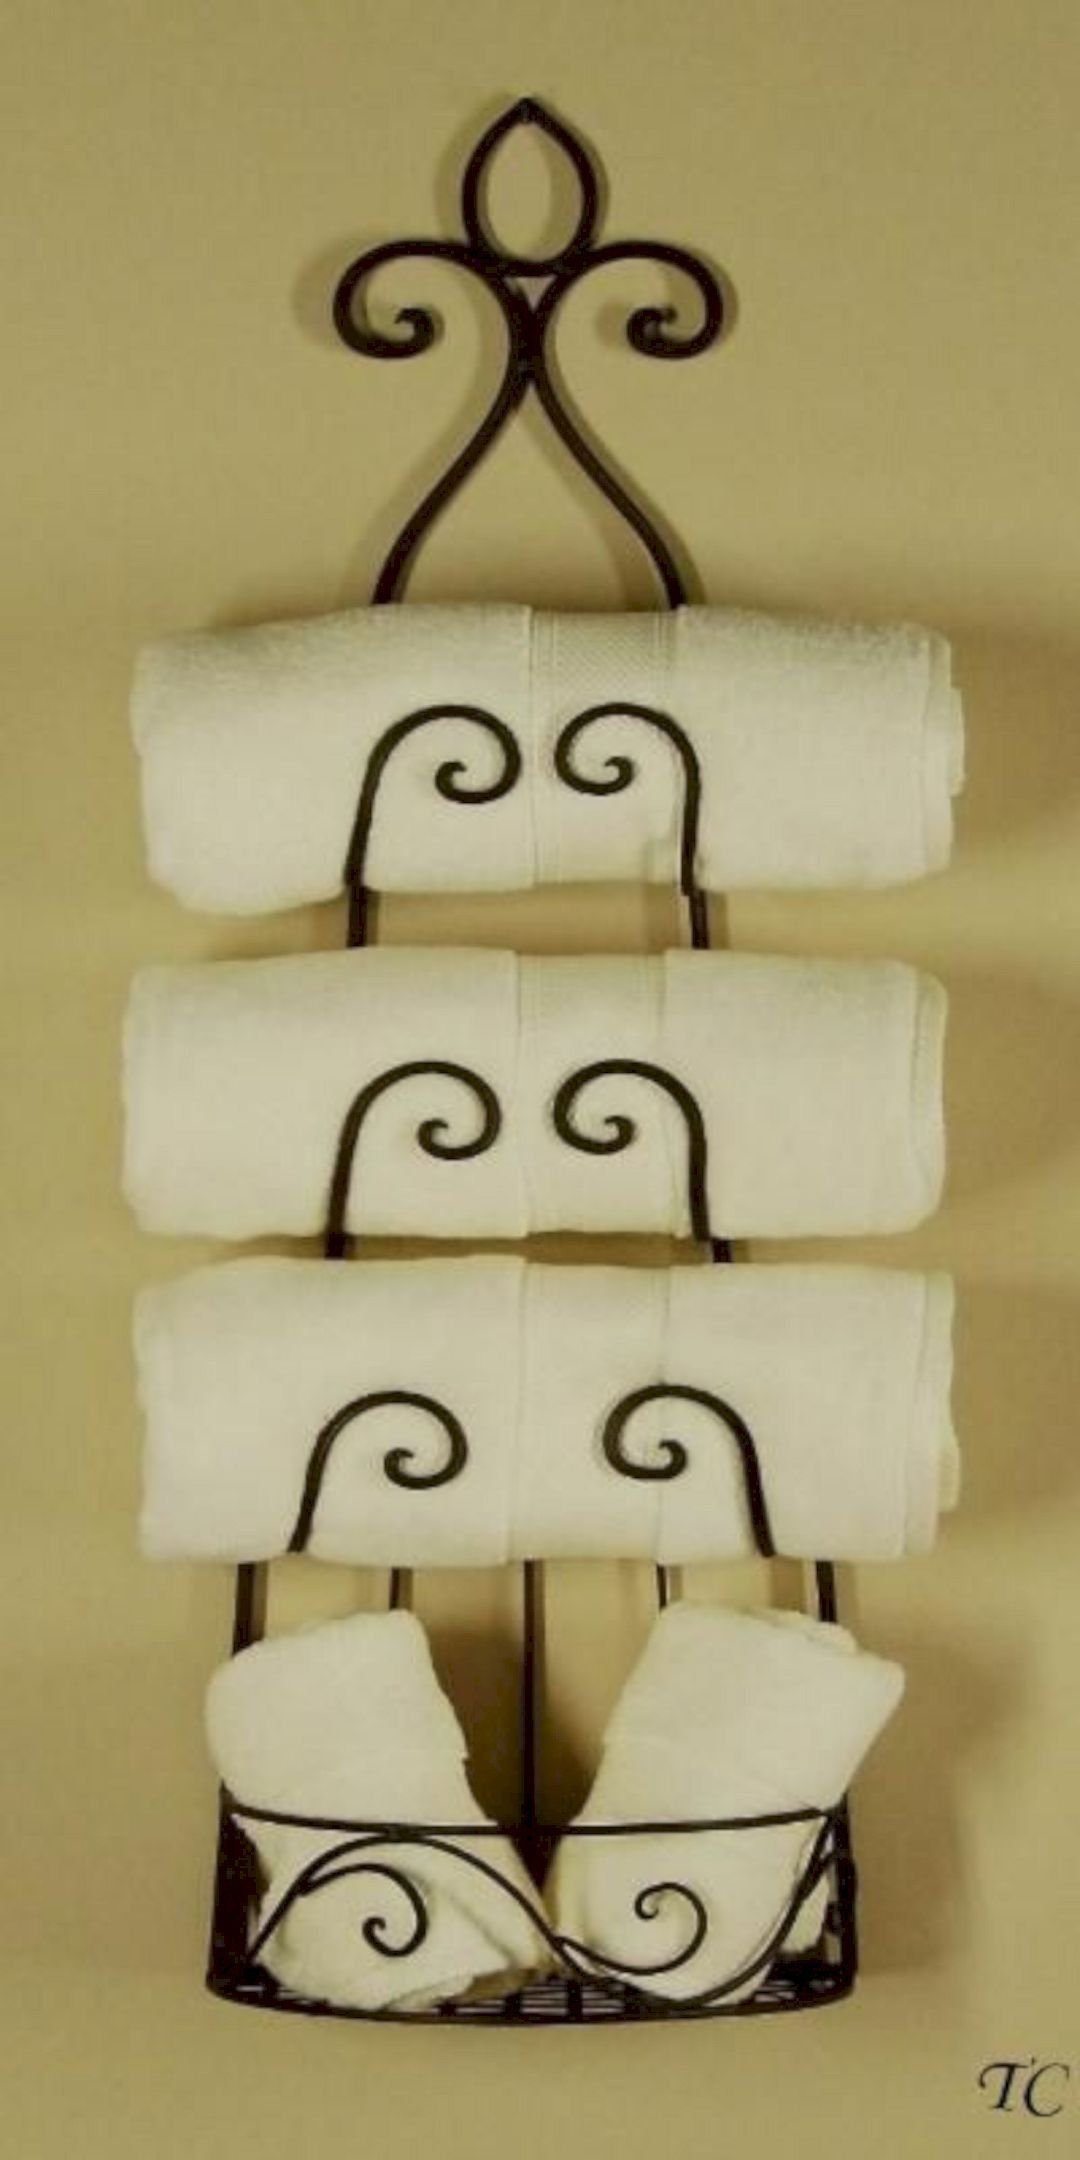 10 Superb Iron Wall Decorations Wine Rack Towel Holder Wine